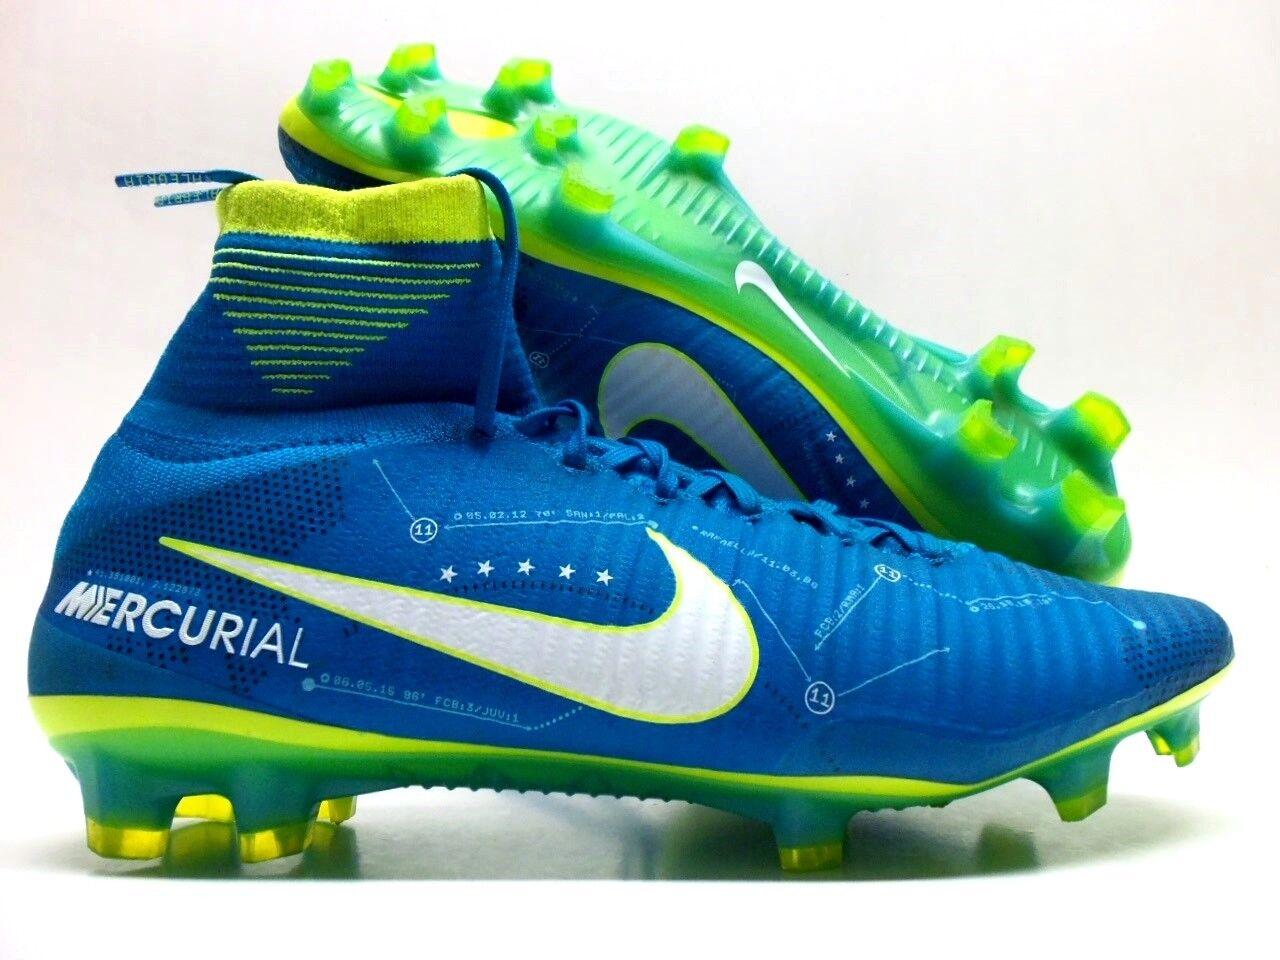 Nike volubile superfly v njr fg neymar junior calcio galloccia sz uomini [921499-400]